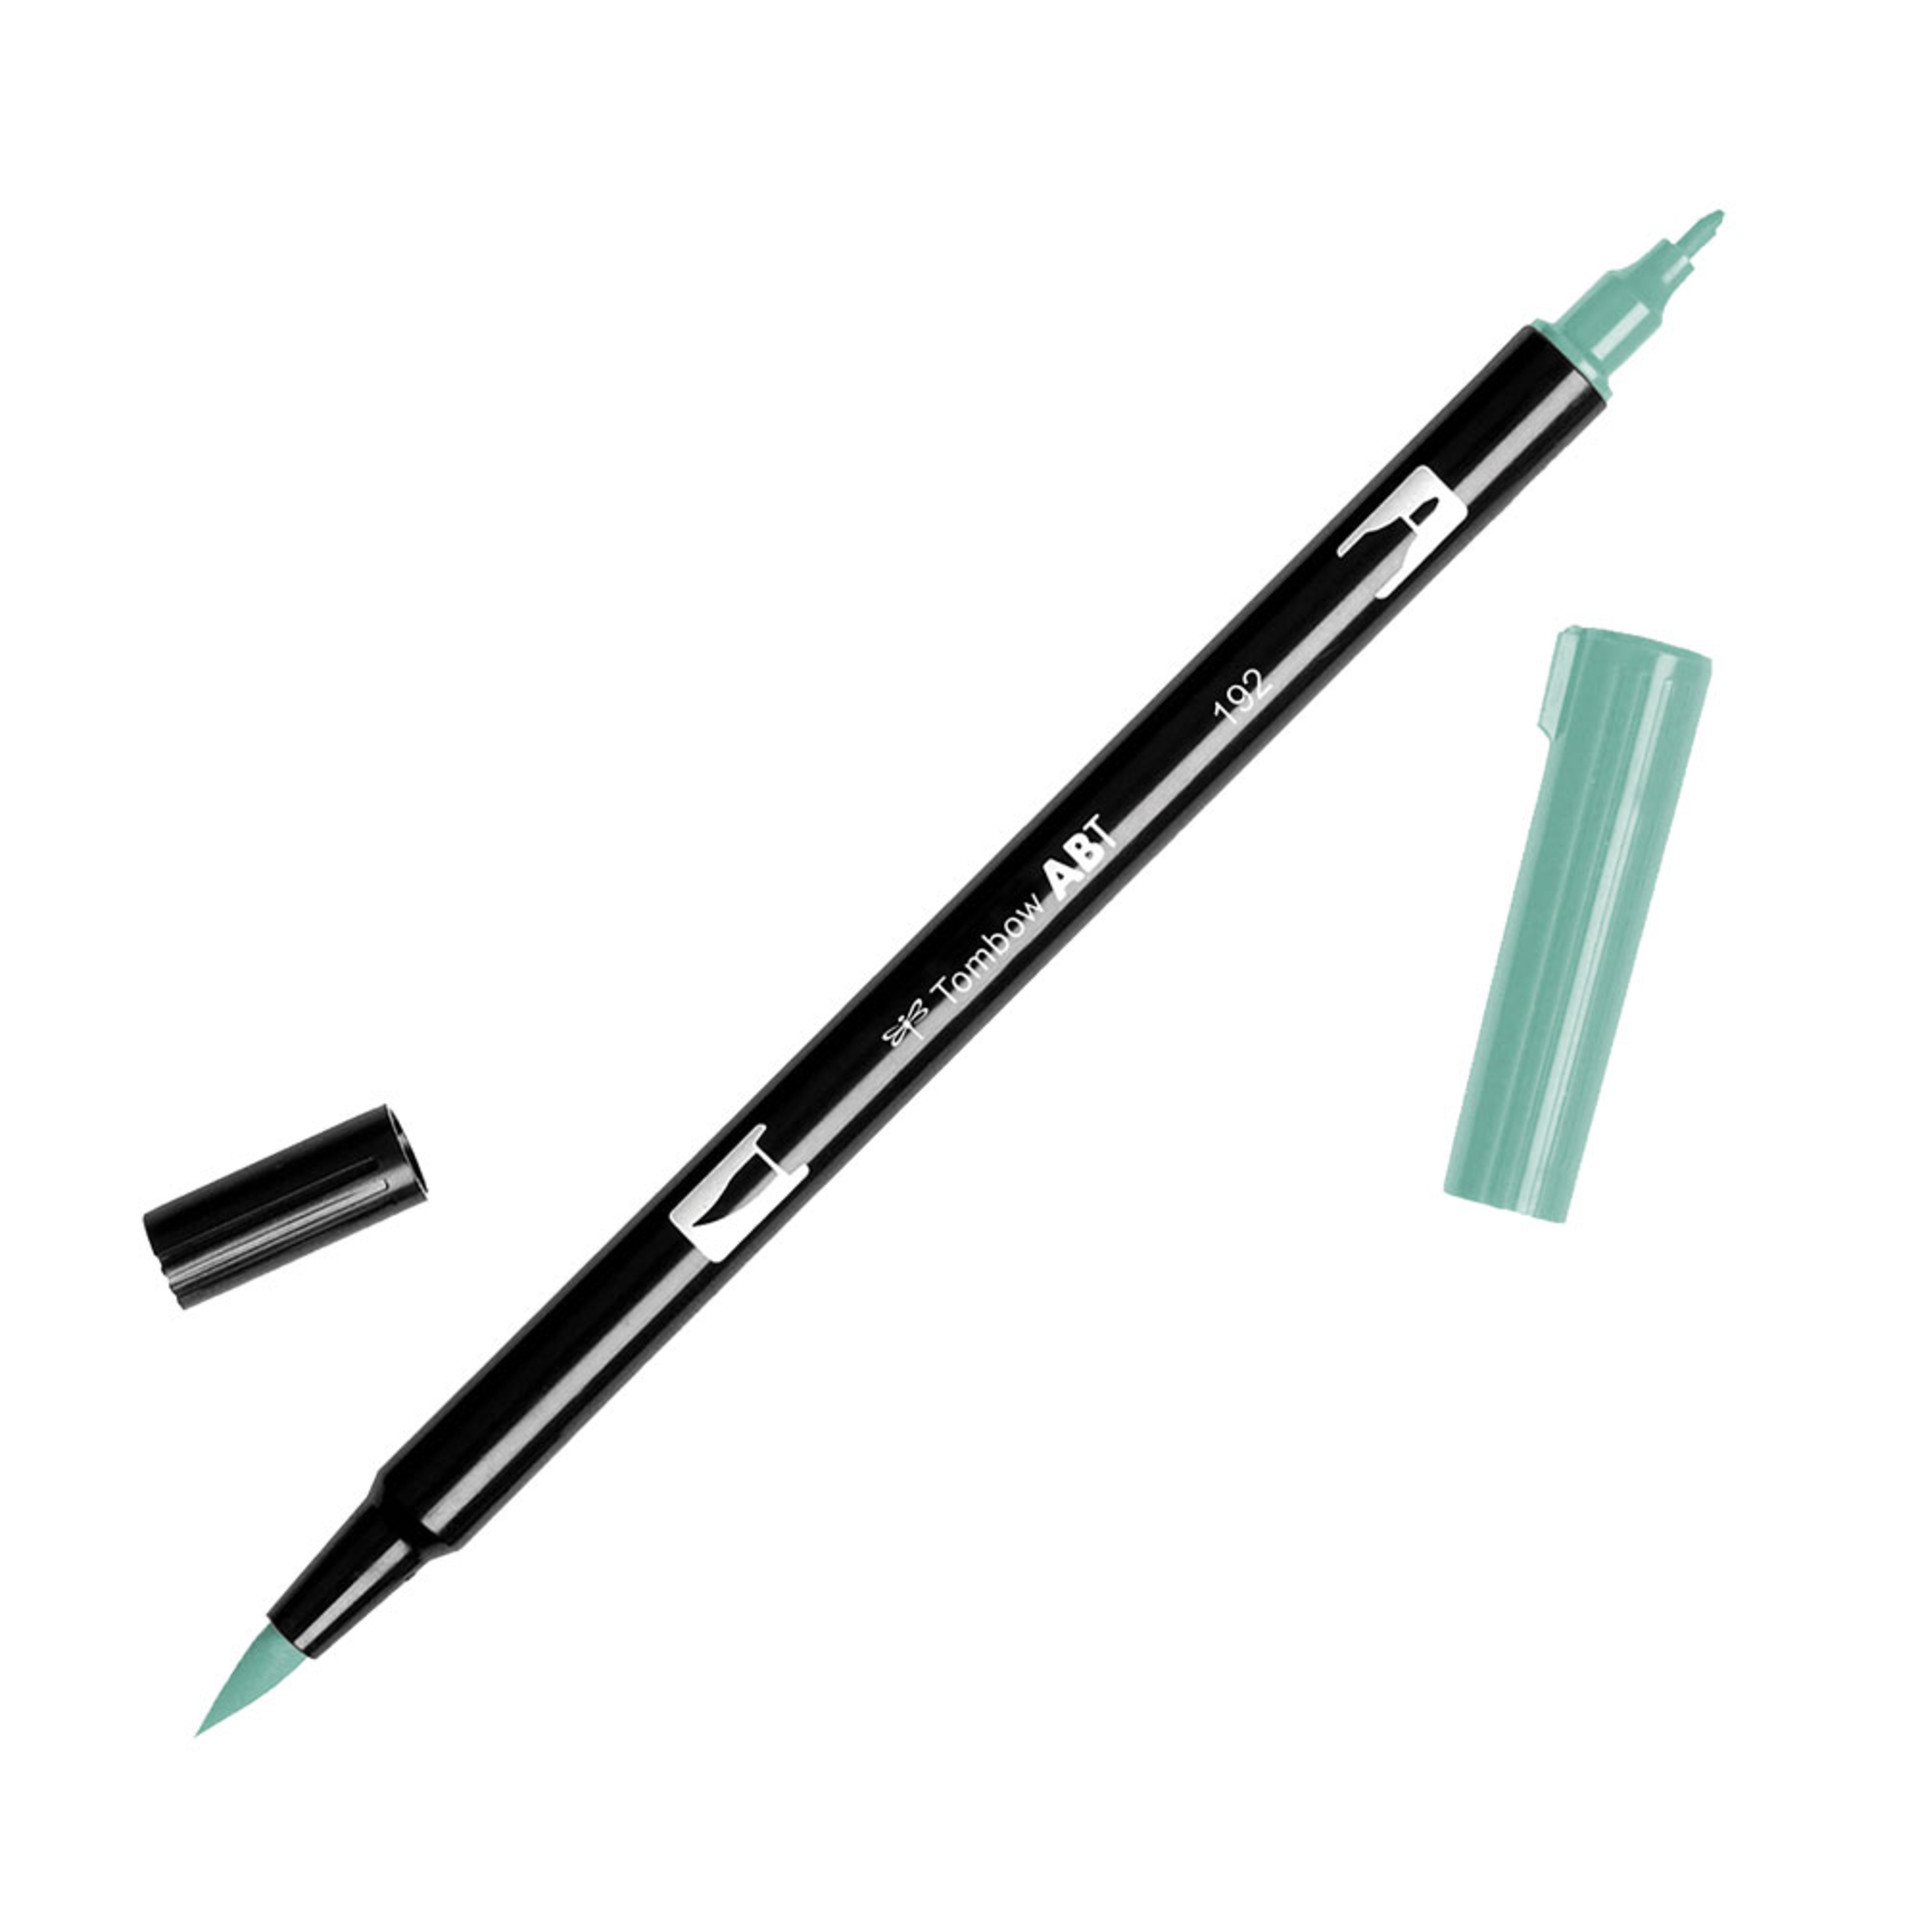 Tombow Dual-Tip Brush Marker Pen – Asparagus